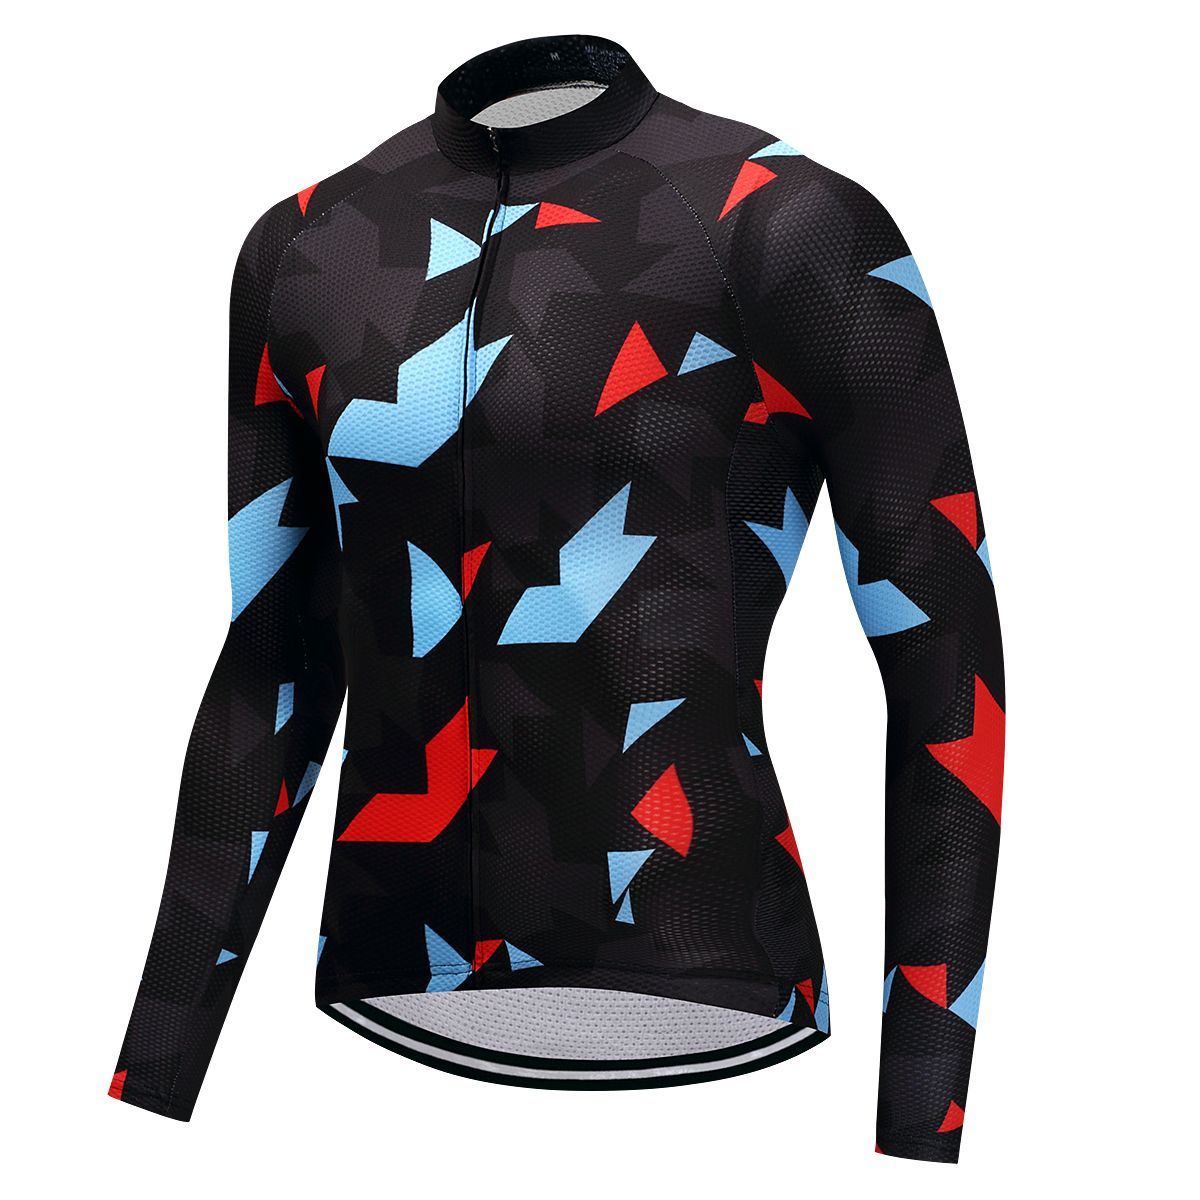 Fualrny Warm 2018 Pro Winter Thermal Fleece Cycling Jersey Ropa Ciclismo Mtb Long Sleeve Men Bike Wear Clothing Maillot #ZR-02